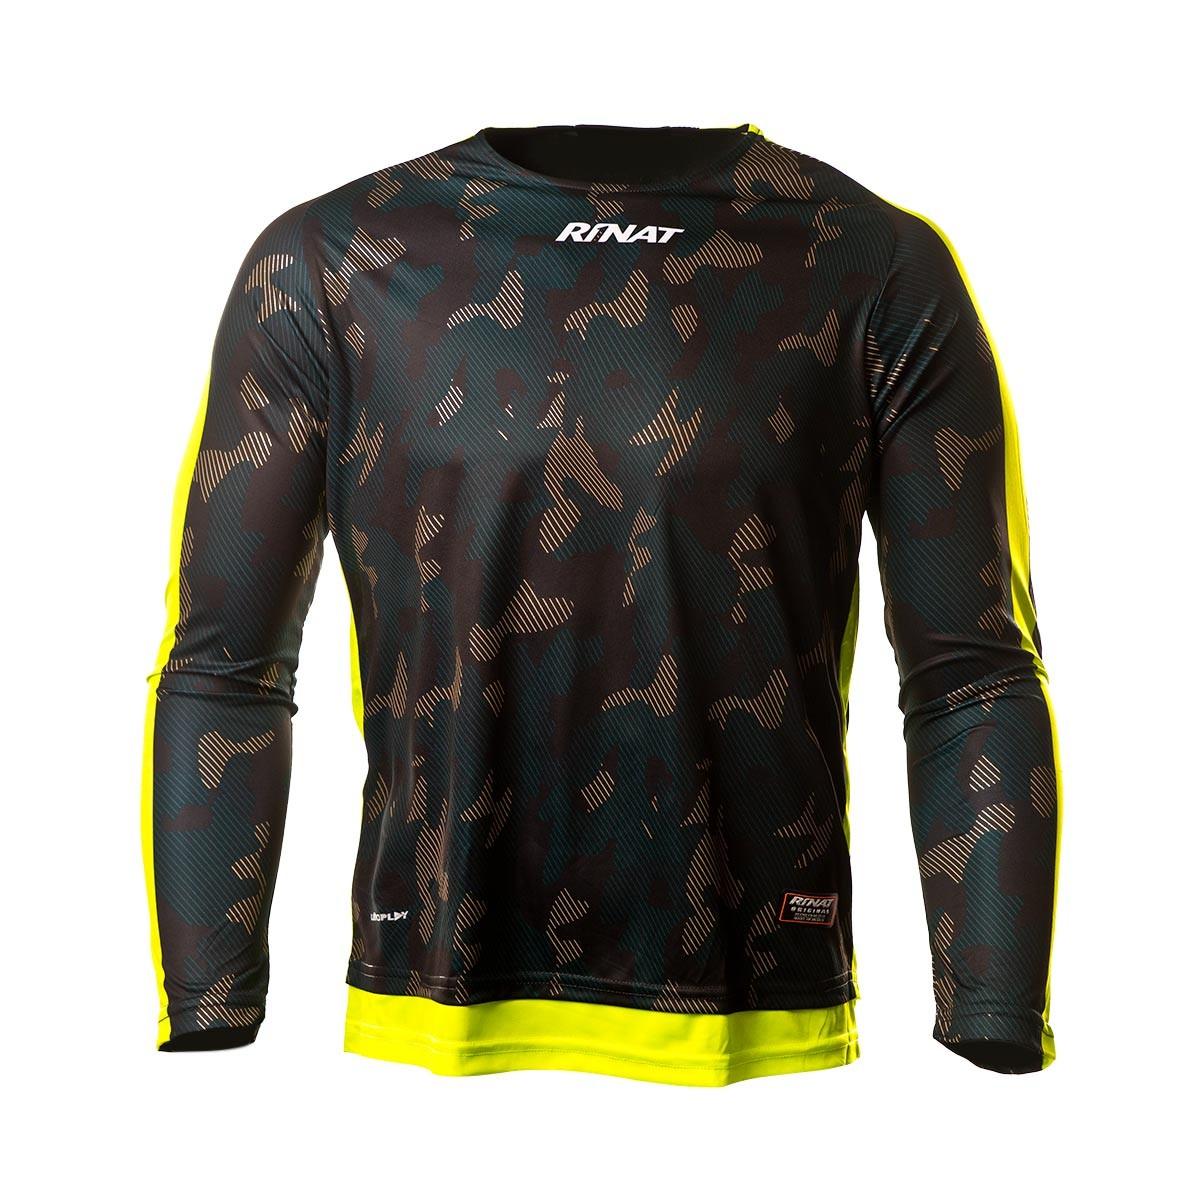 32cf875b9e5 Jersey Rinat Sniper Black-Yellow - Football store Fútbol Emotion